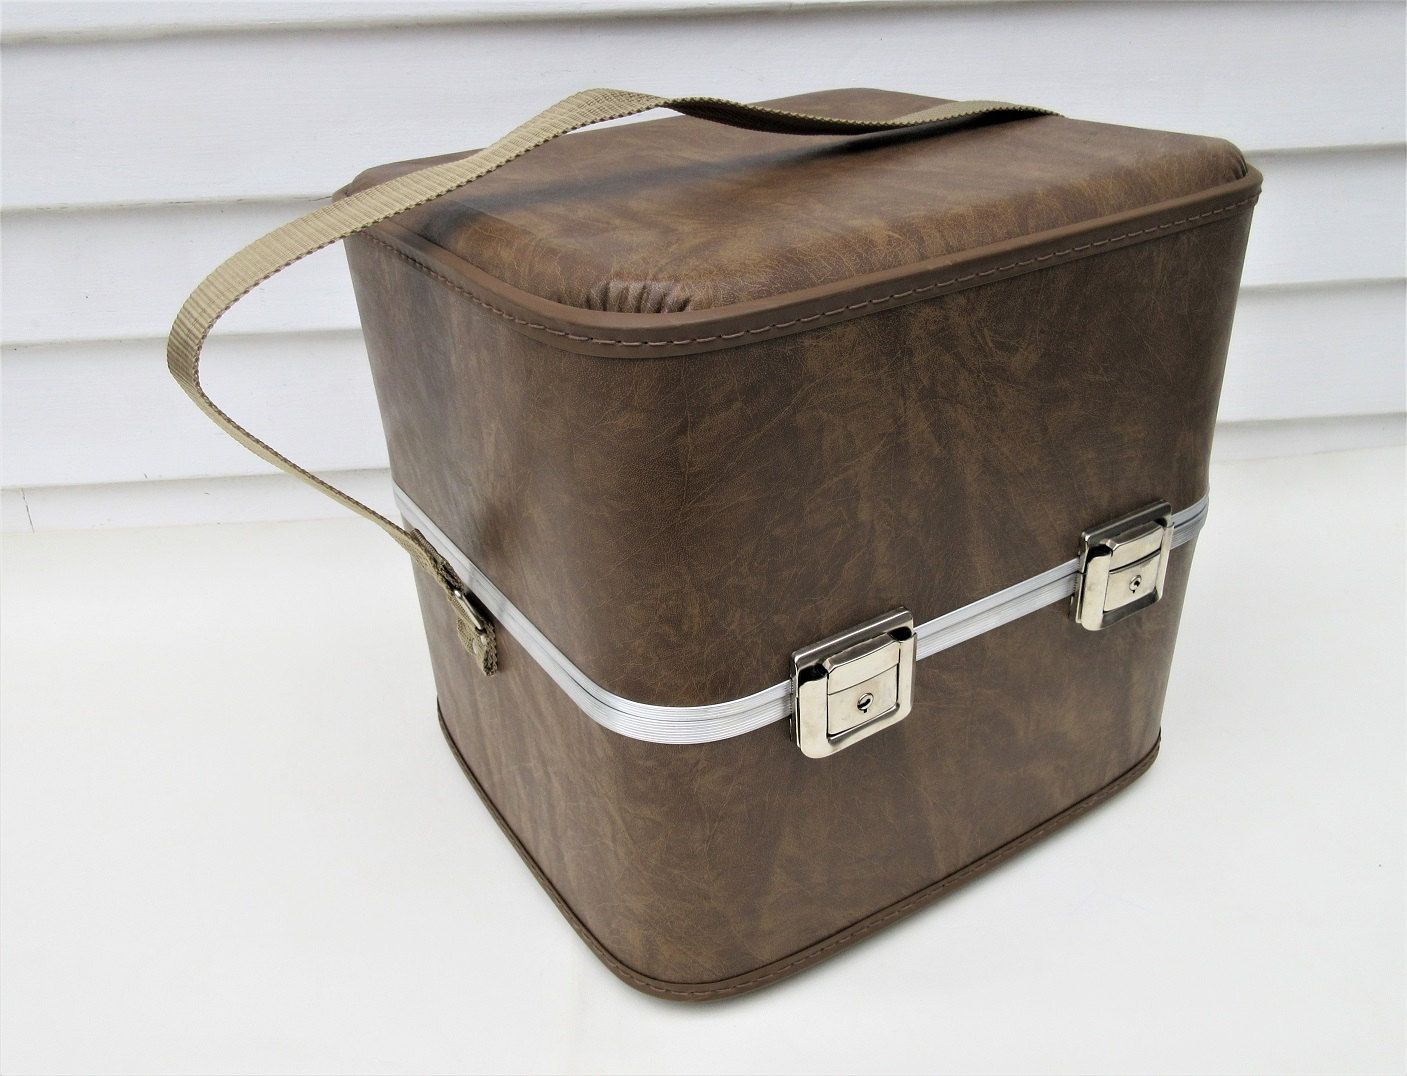 Vintage Suitcase Travel Hat Box Hard Case Shoe Storage Boot Bag